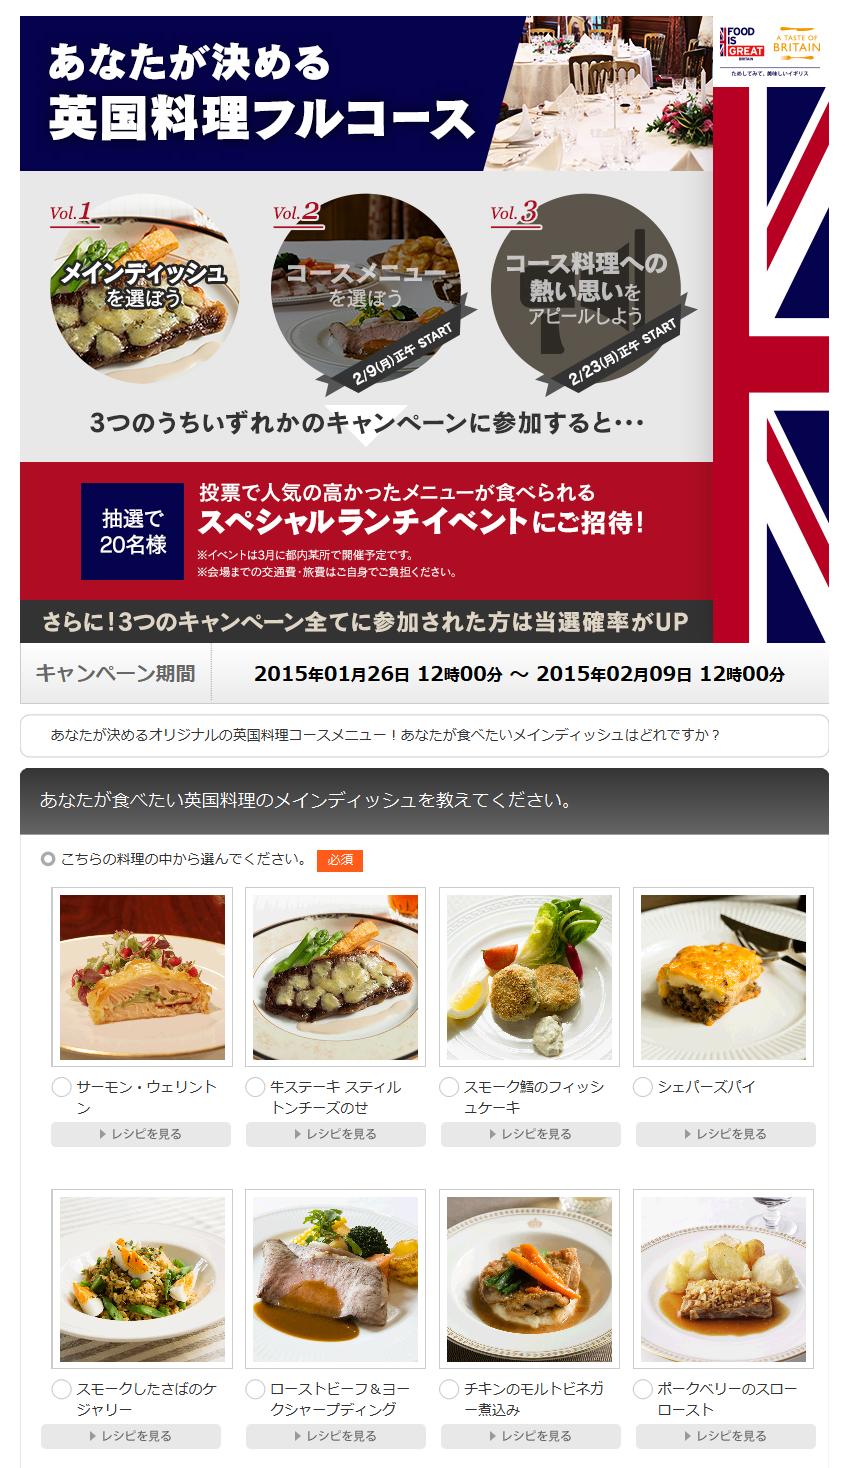 A_Taste_of_Britain_20150126